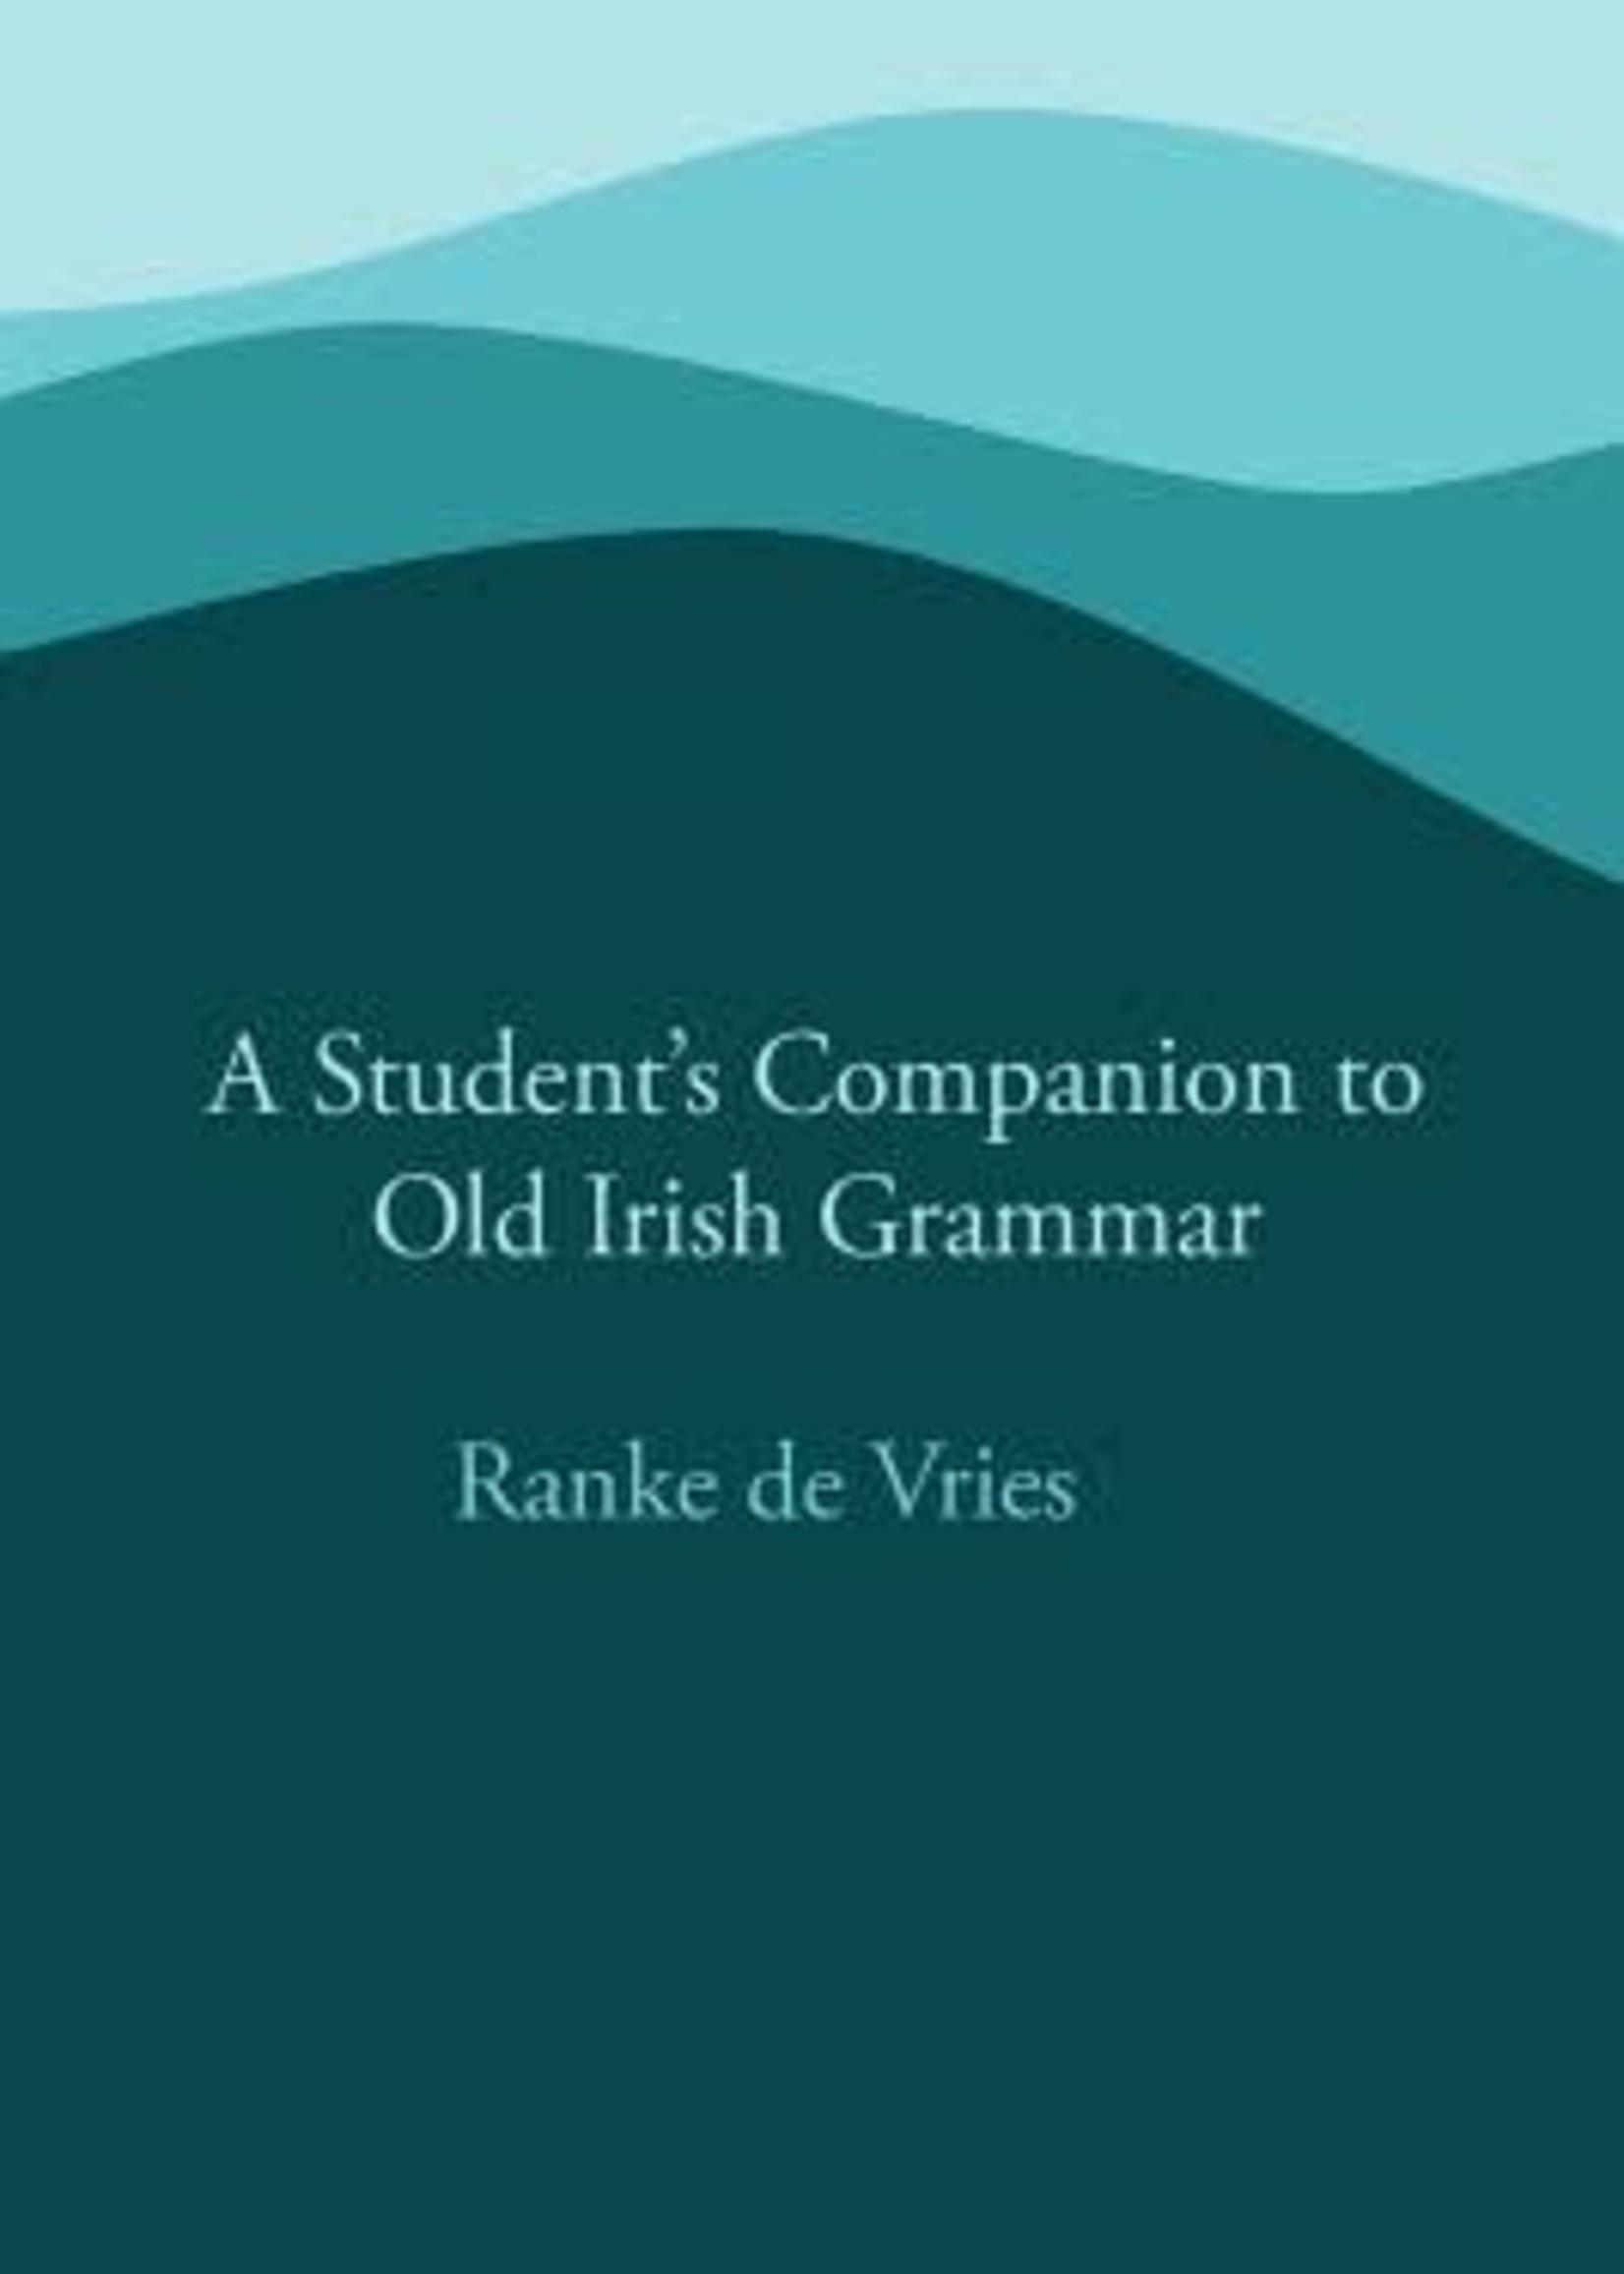 A Student's Companion to Old Irish Grammar by Ranke de Vries